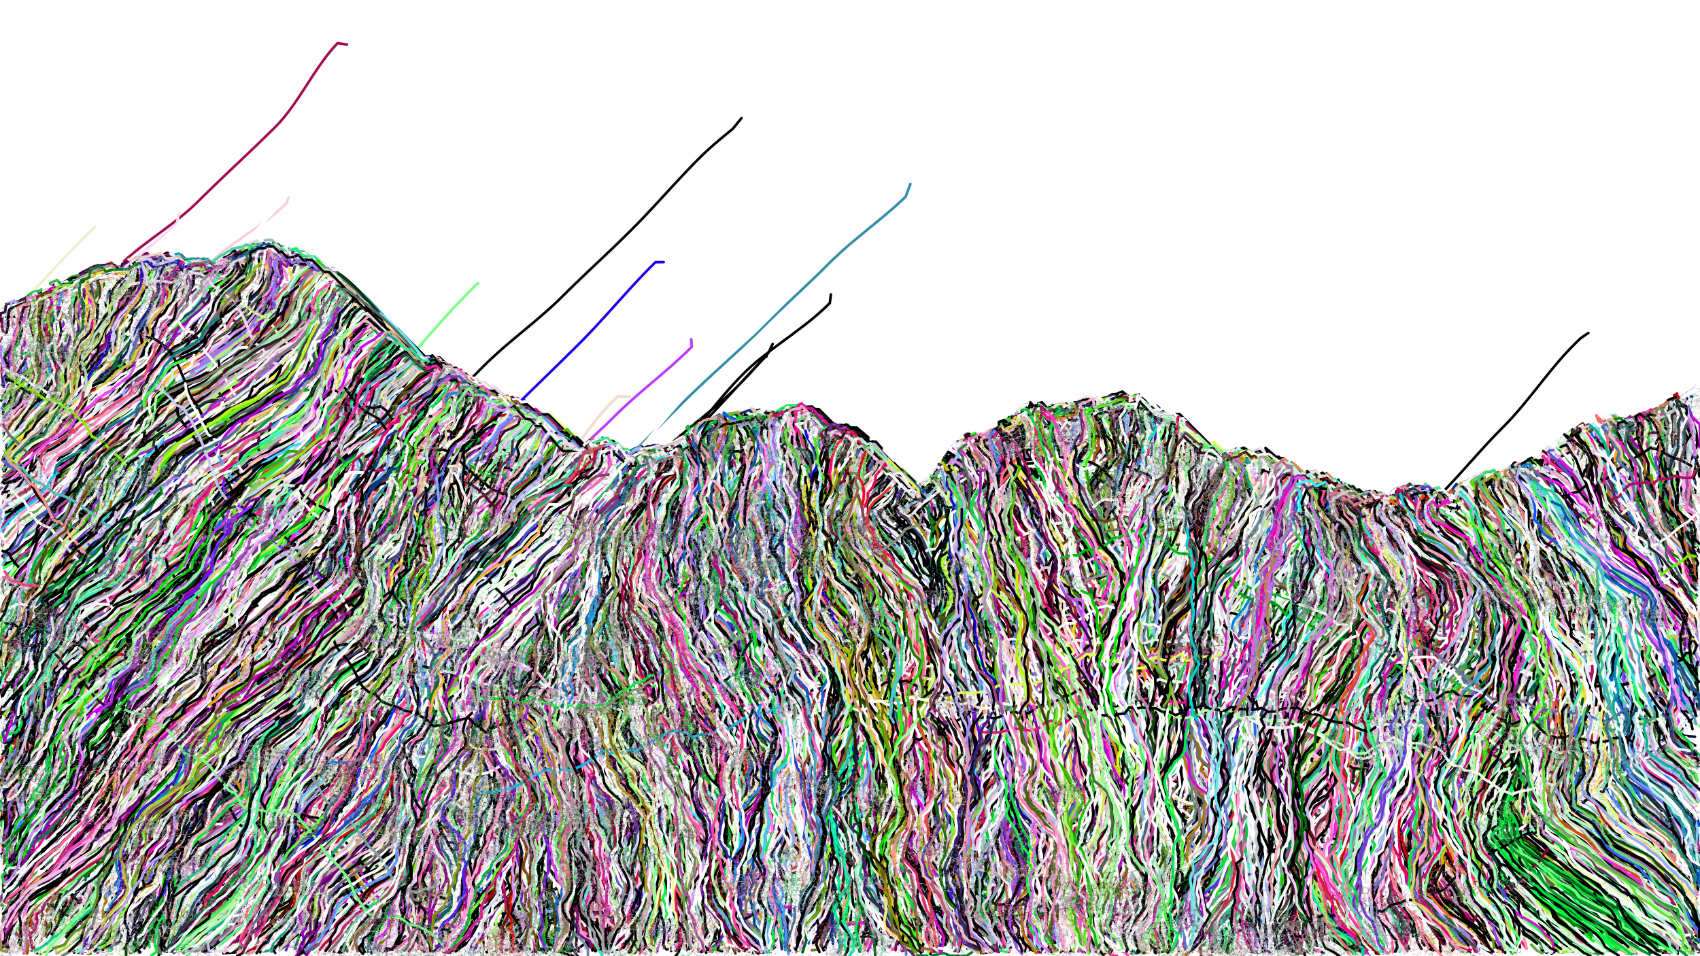 landscape data, 2018, inkjet on Hahnemühle fine art paper